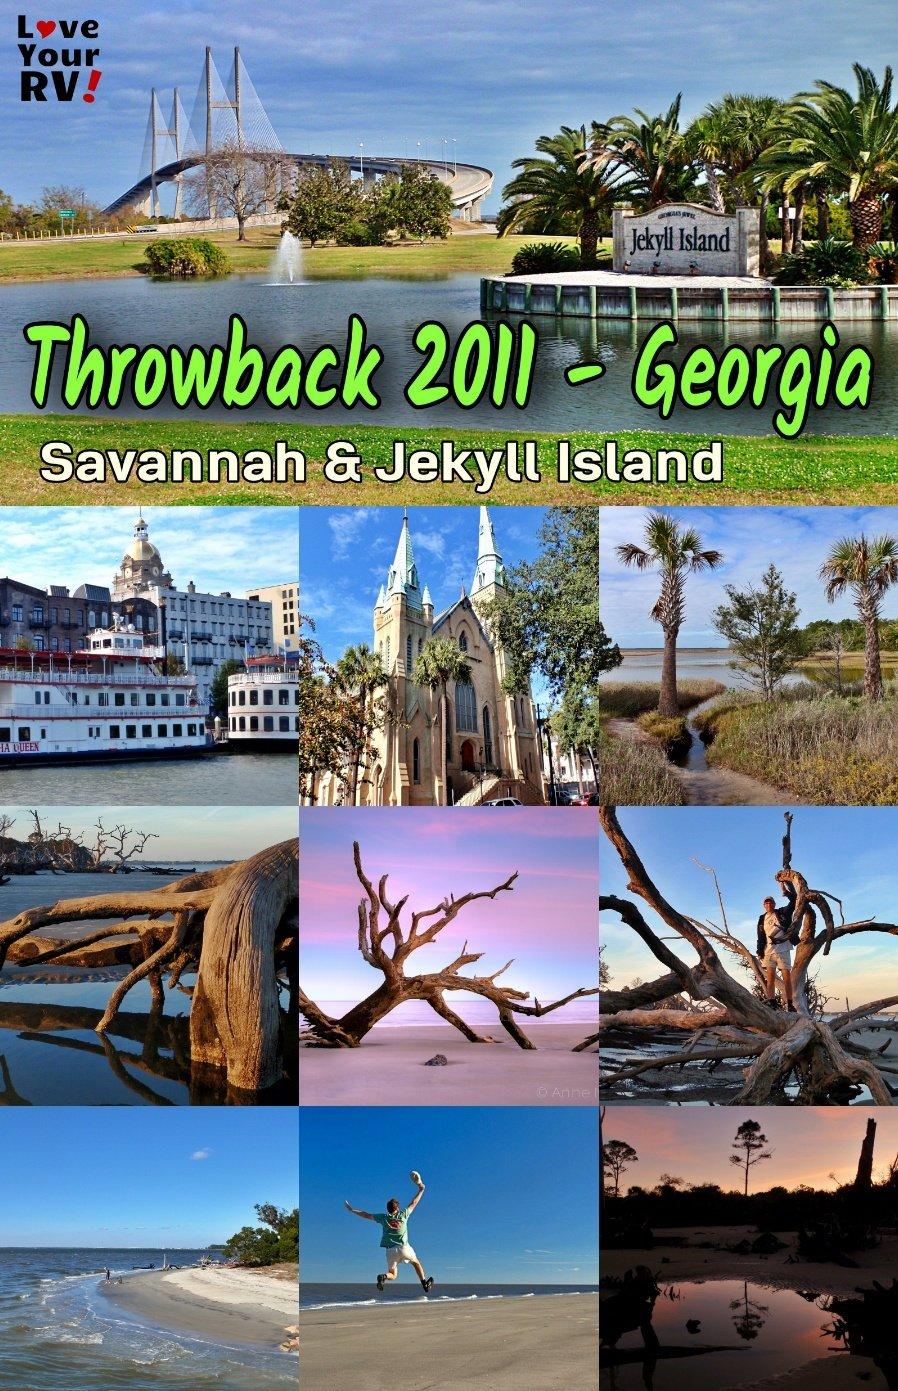 Coastal Georgia (Savannah & Jekyll Island) Nov 2011 Throwback Video